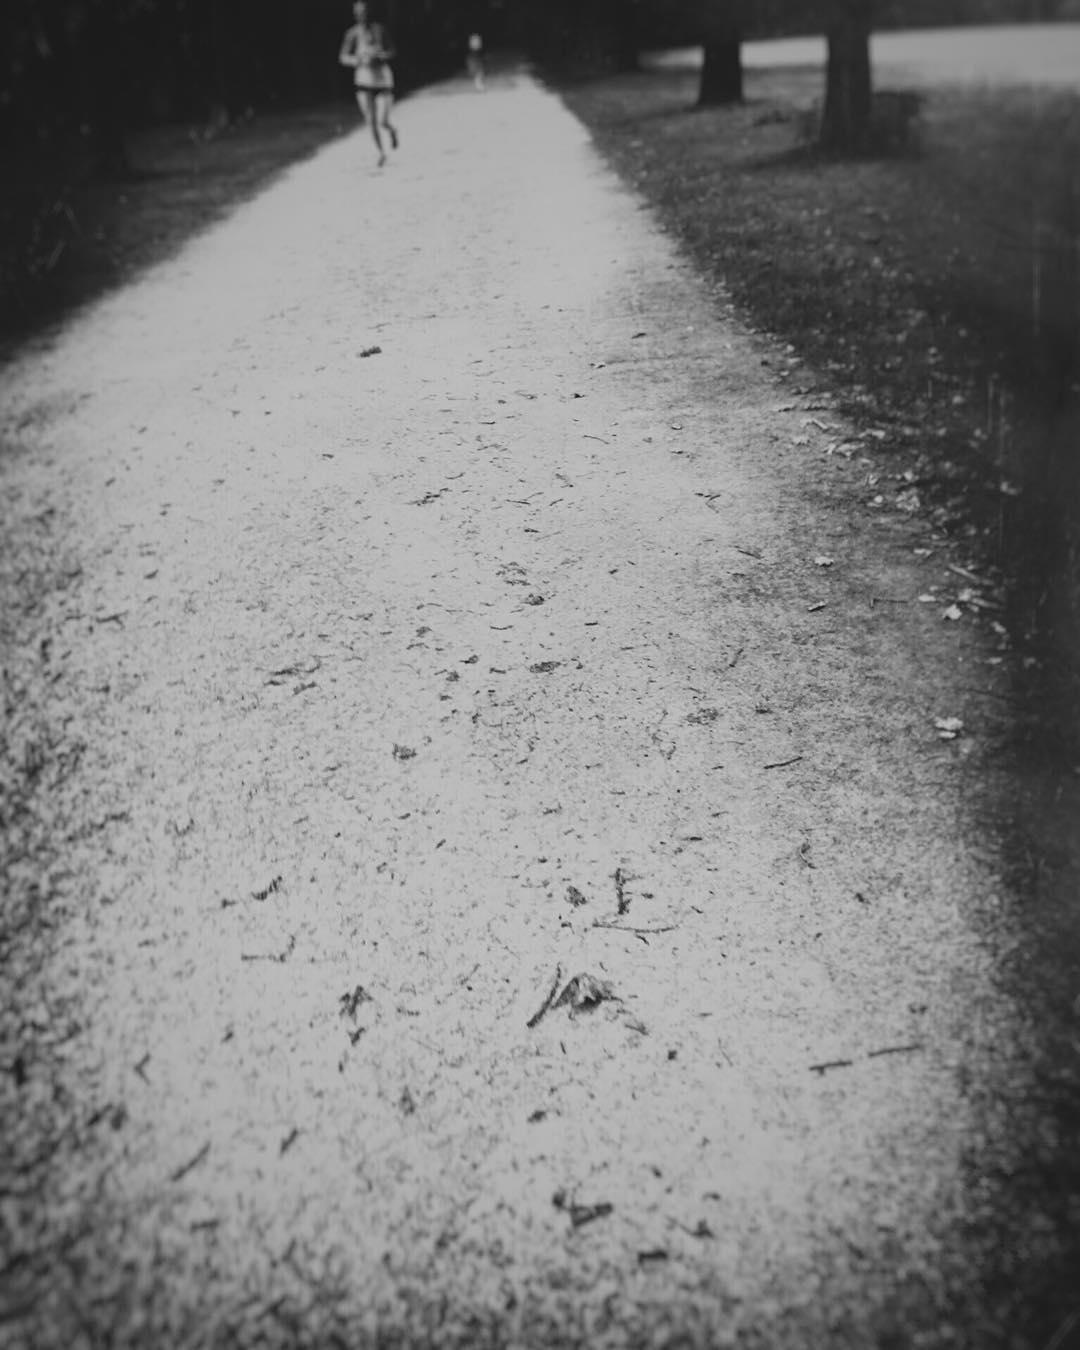 Path-ology of a runner